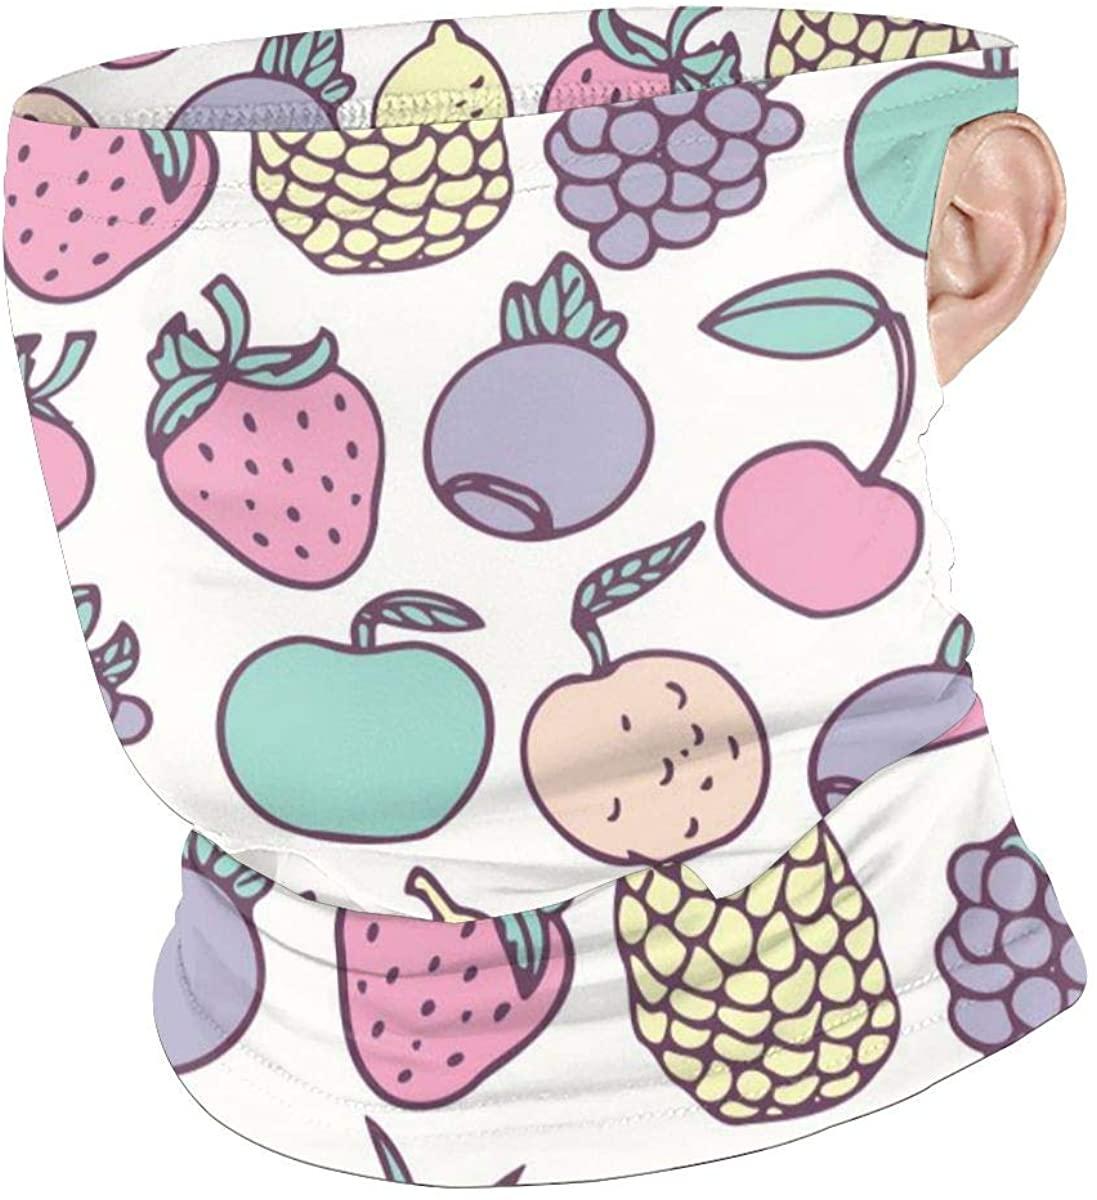 Lemon Pineapple Fruit Creative Lugs Face Mouth Mask Windproof Windbreak For Dust Festivals Scarf Bandana